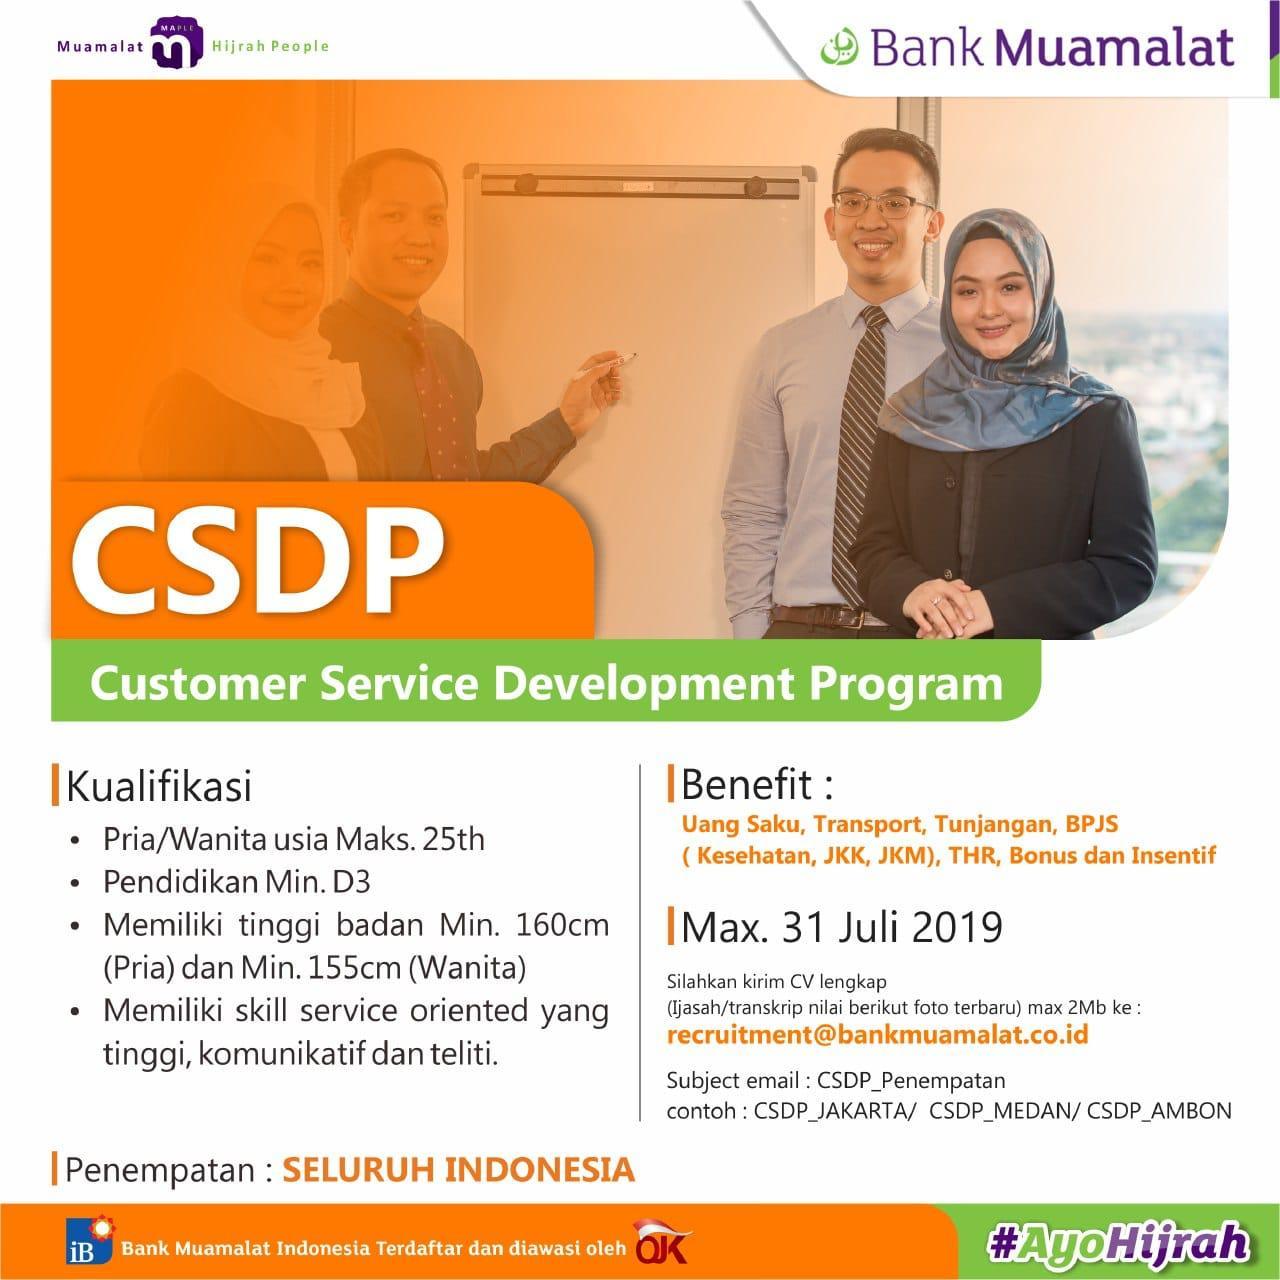 CUSTOMER SERVICE DEVELOPMENT PROGRAM (CSDP) BANK MUAMALAT